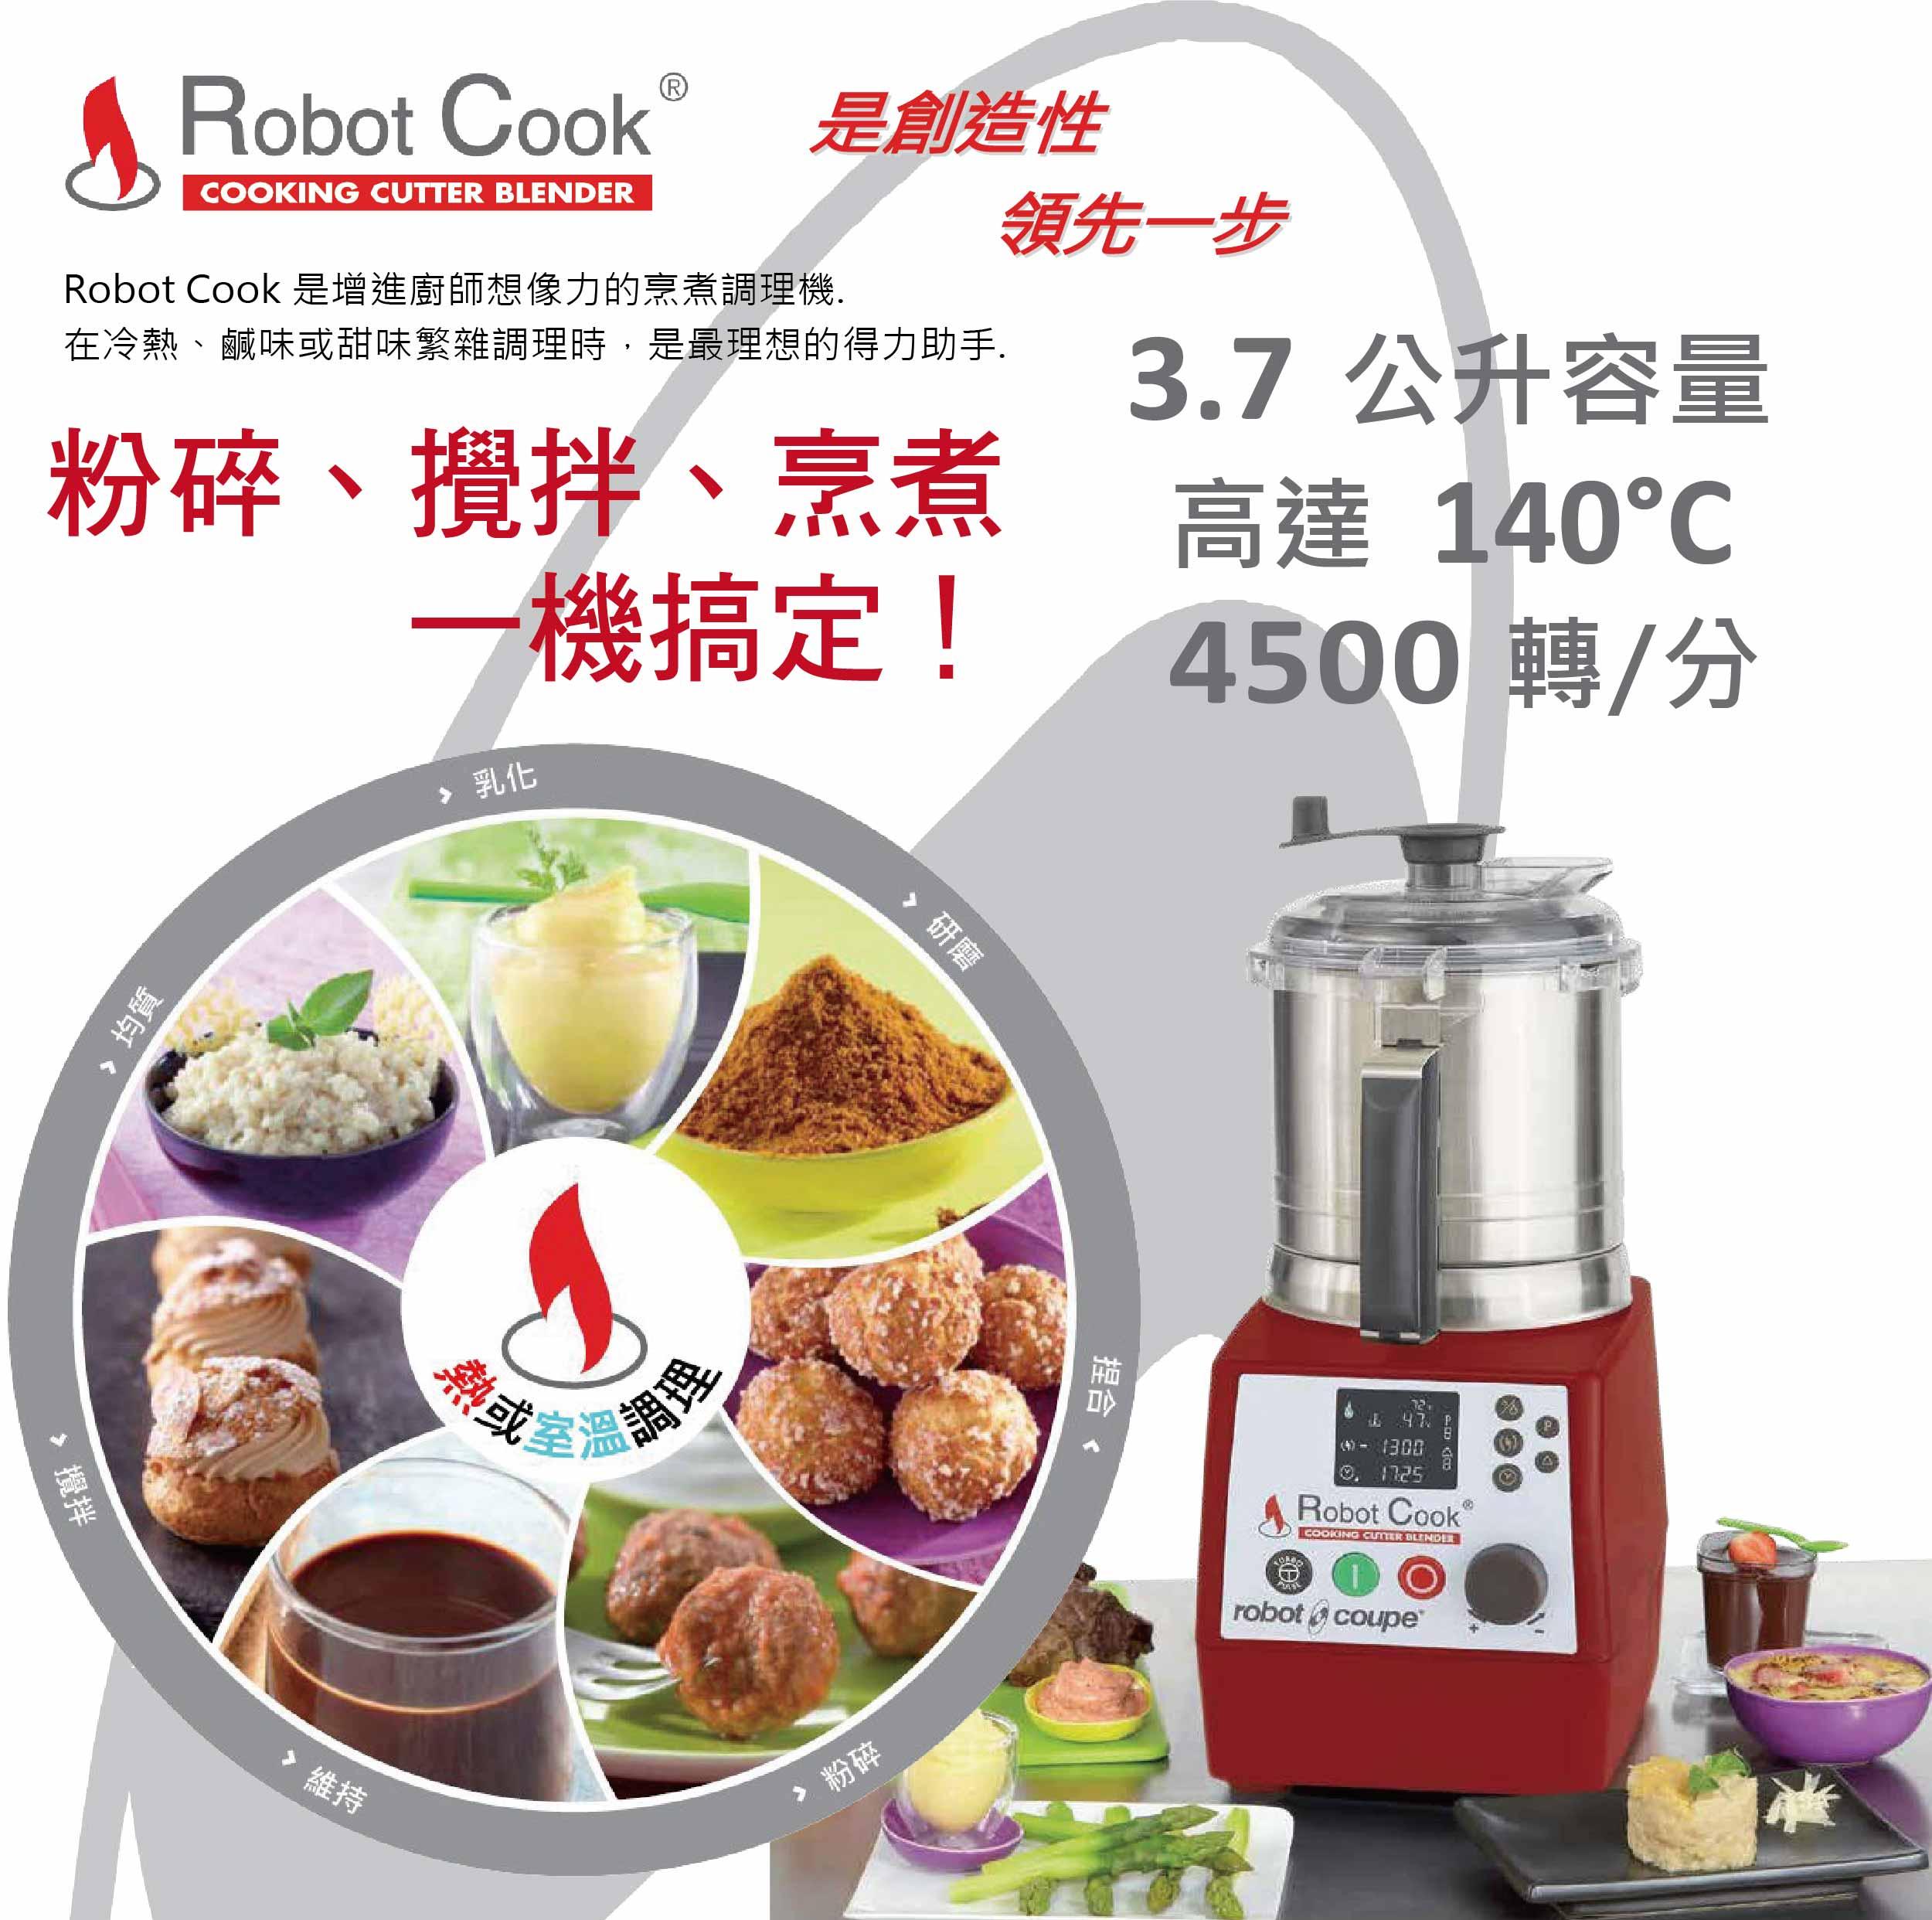 Robot Cook 烹煮調理機